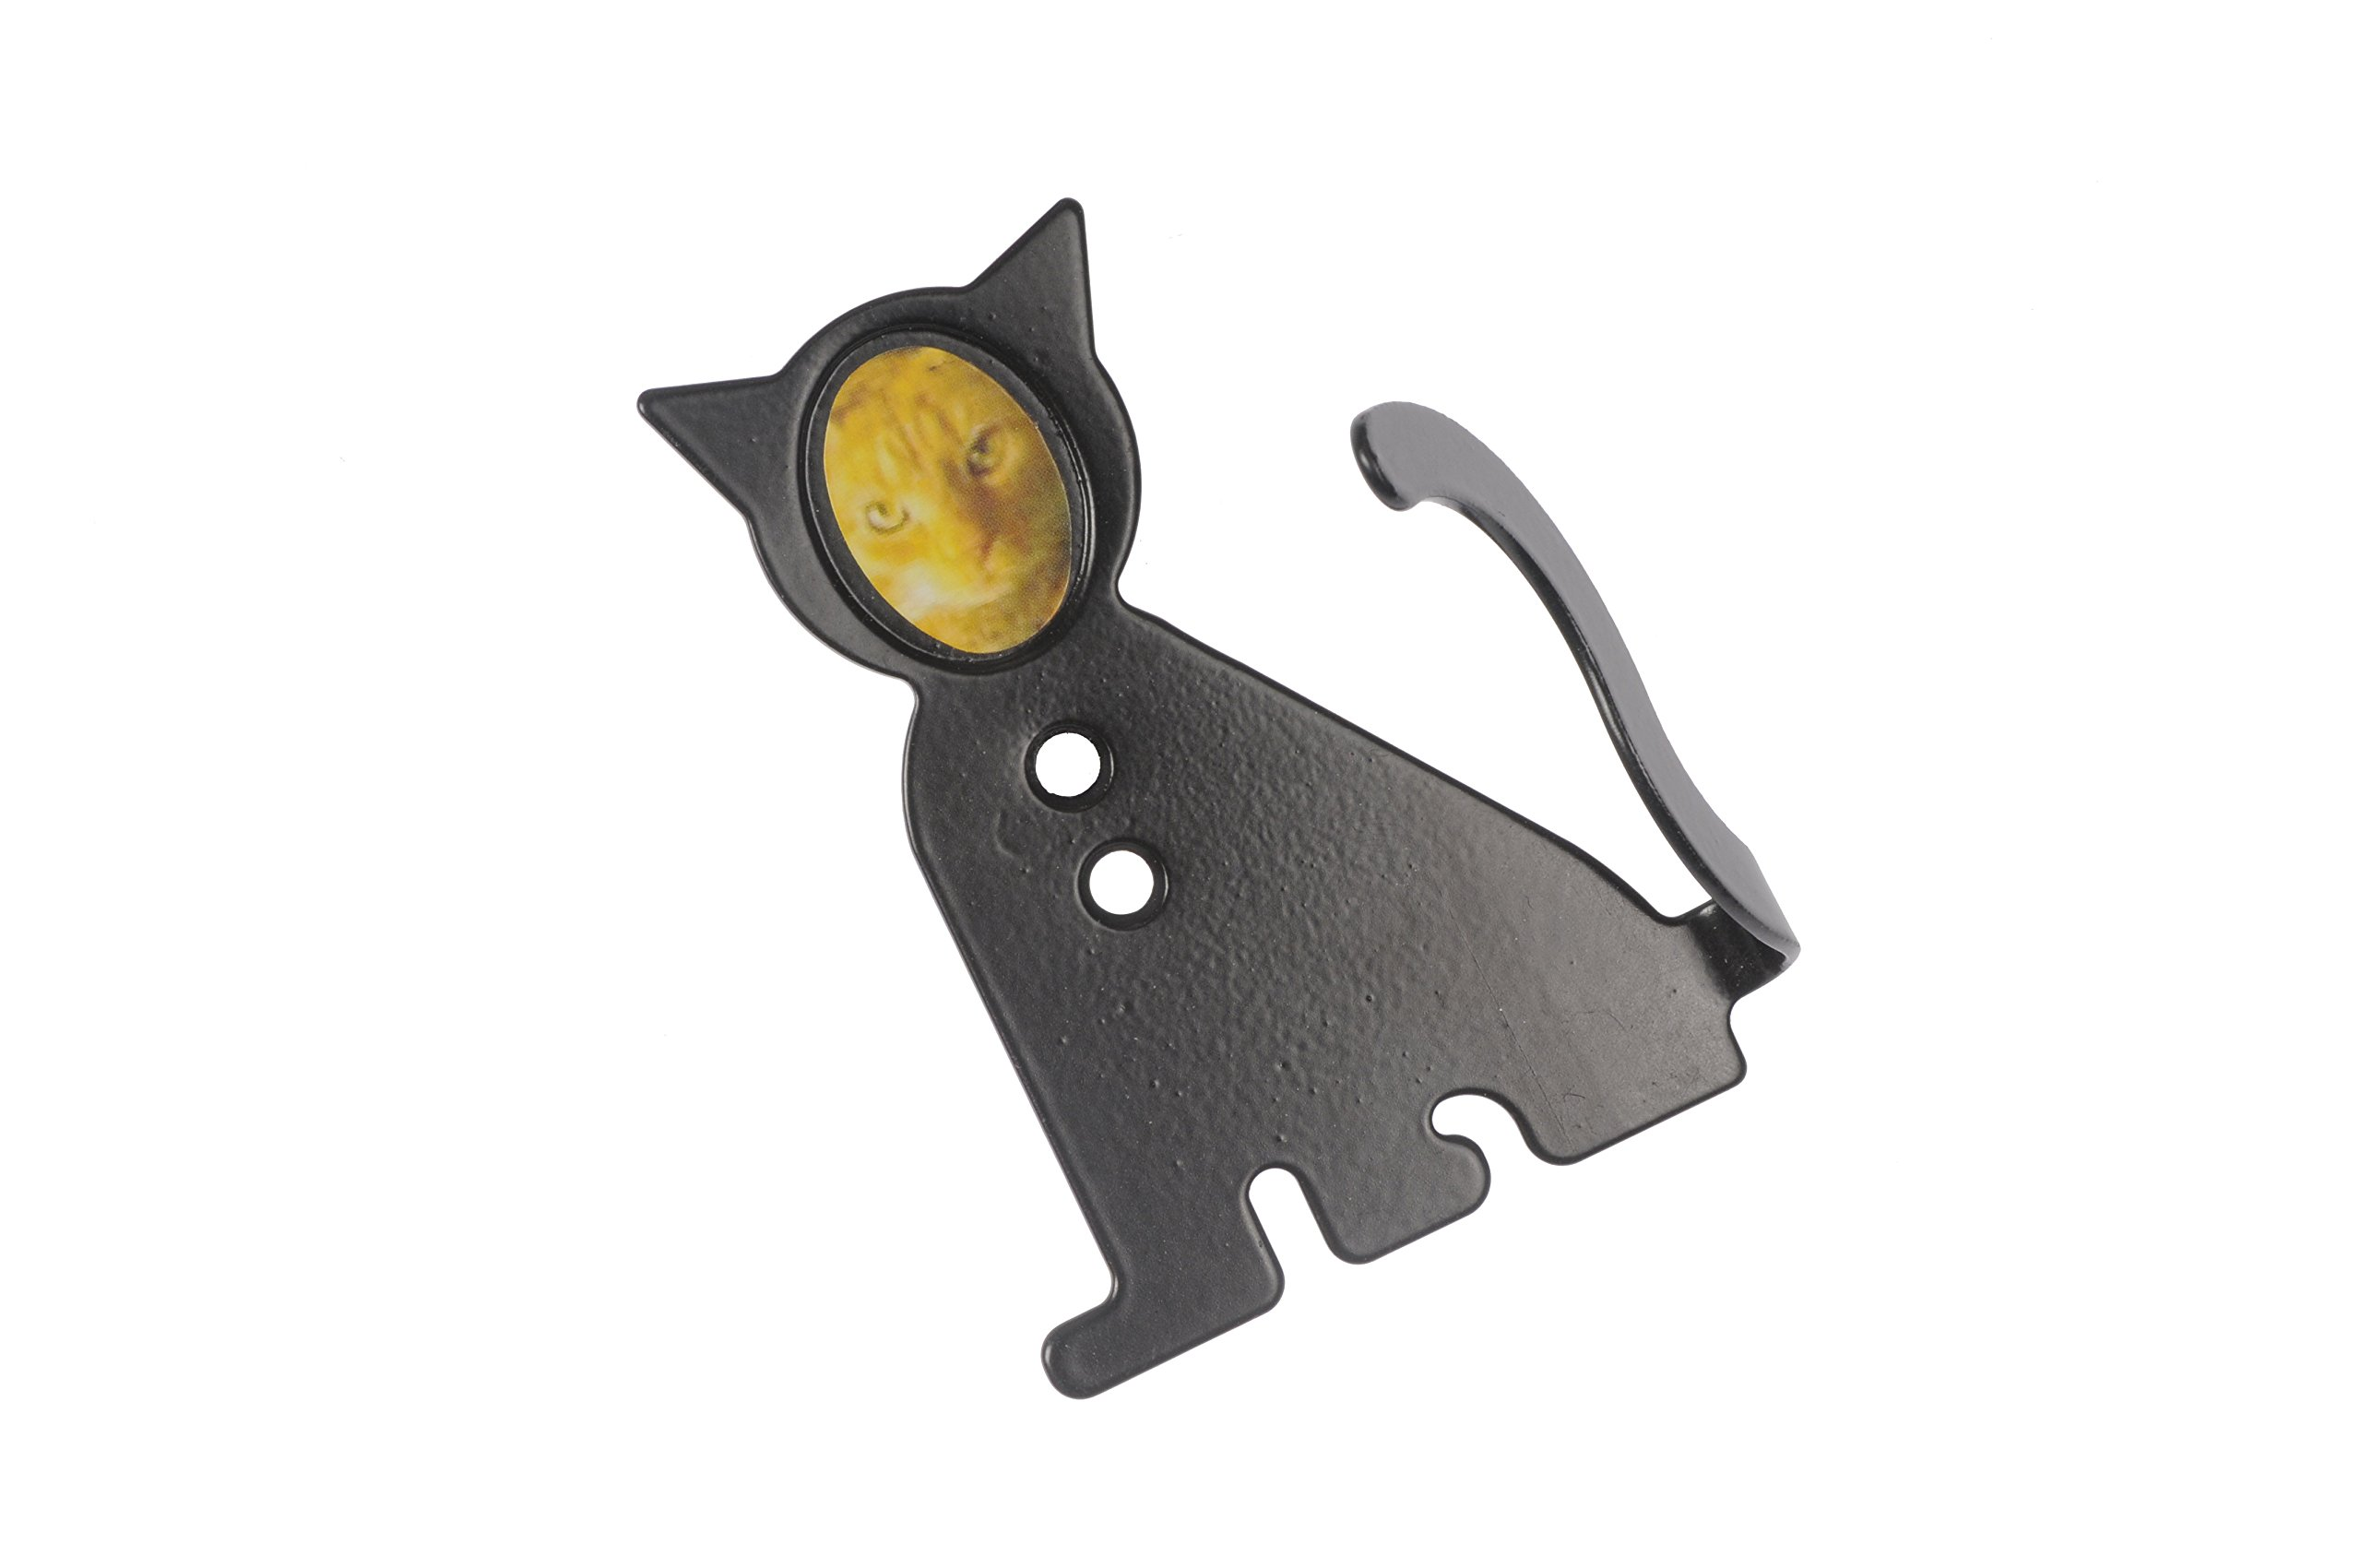 Dorman Hardware 4-2918 One Hook Add Your Pix Cat Figure